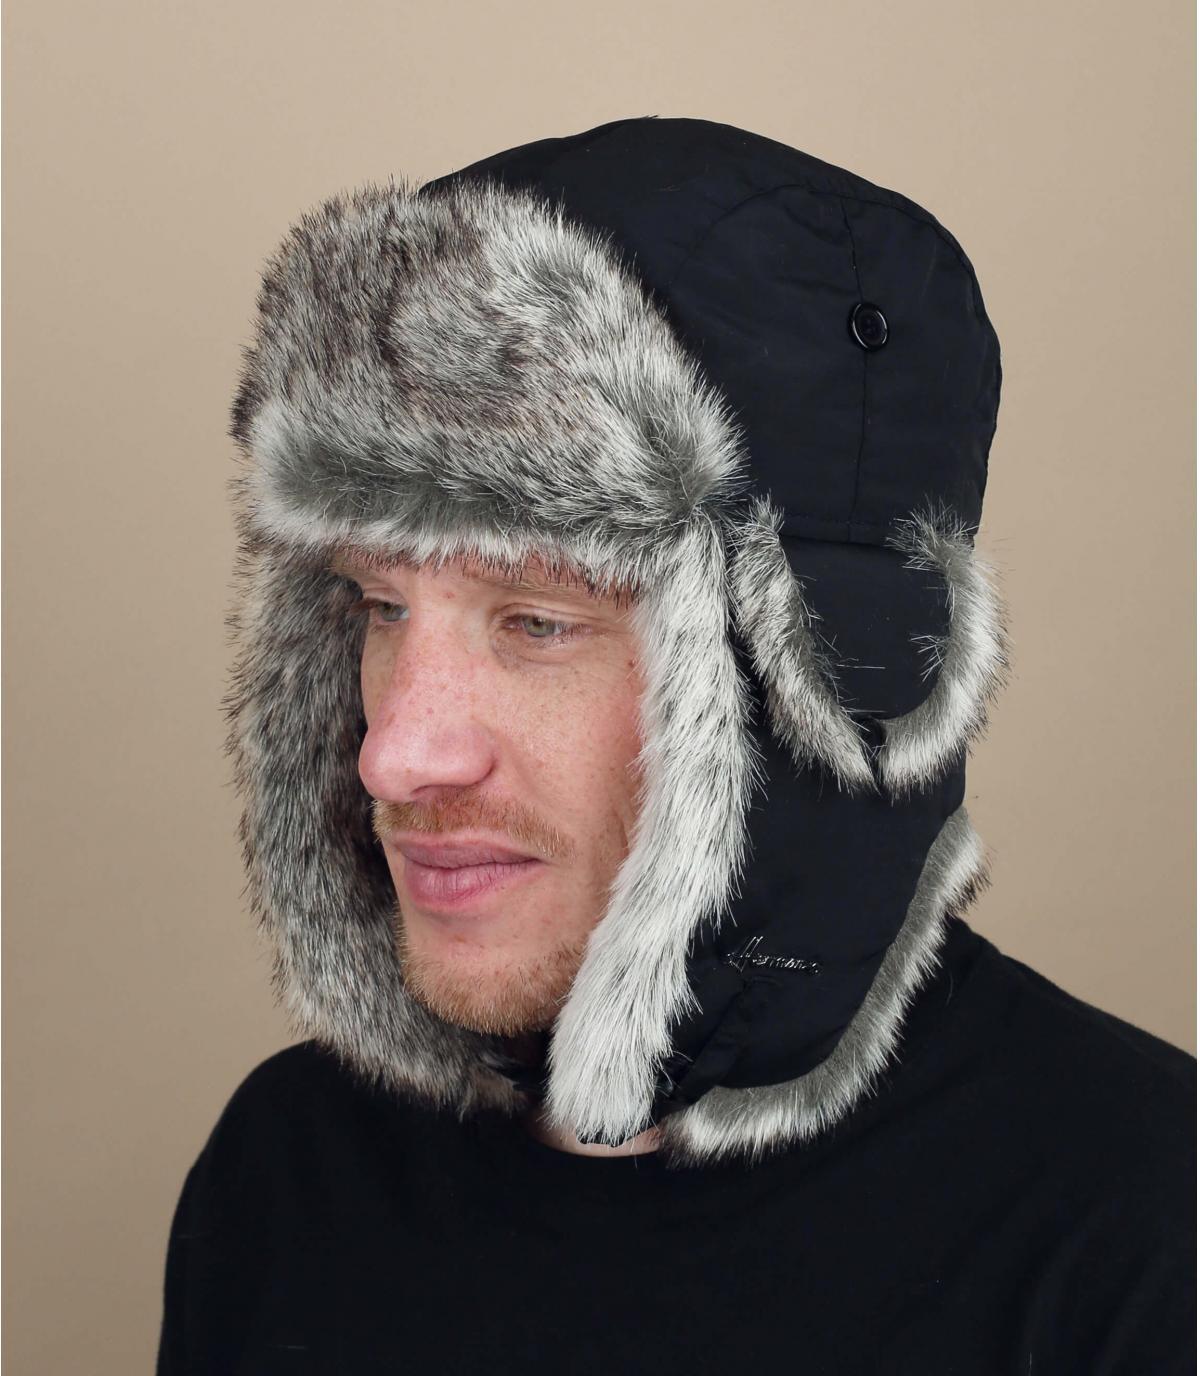 cappello di pelliccia nera